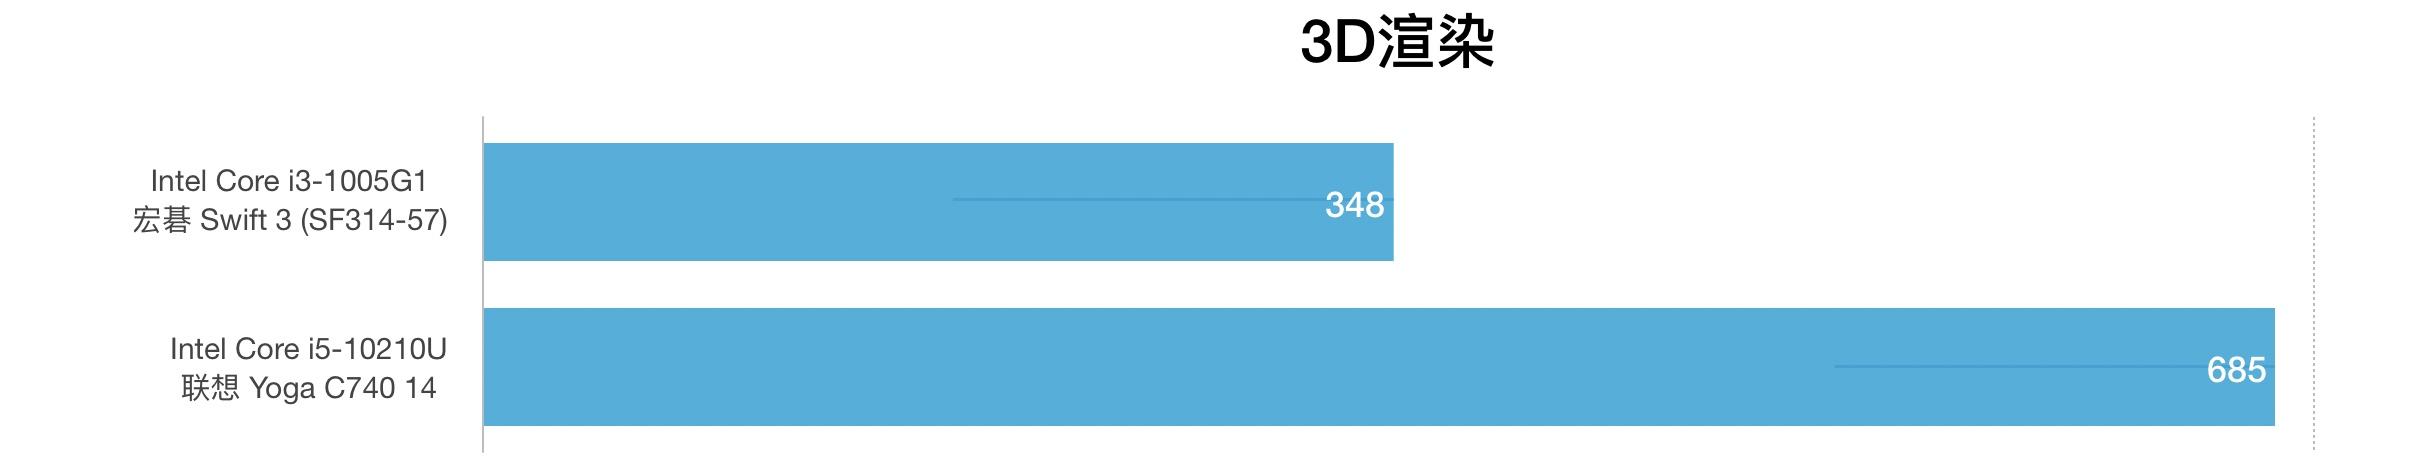 Intel Core i3-1005G1和i5-10210U性能跑分对比评测